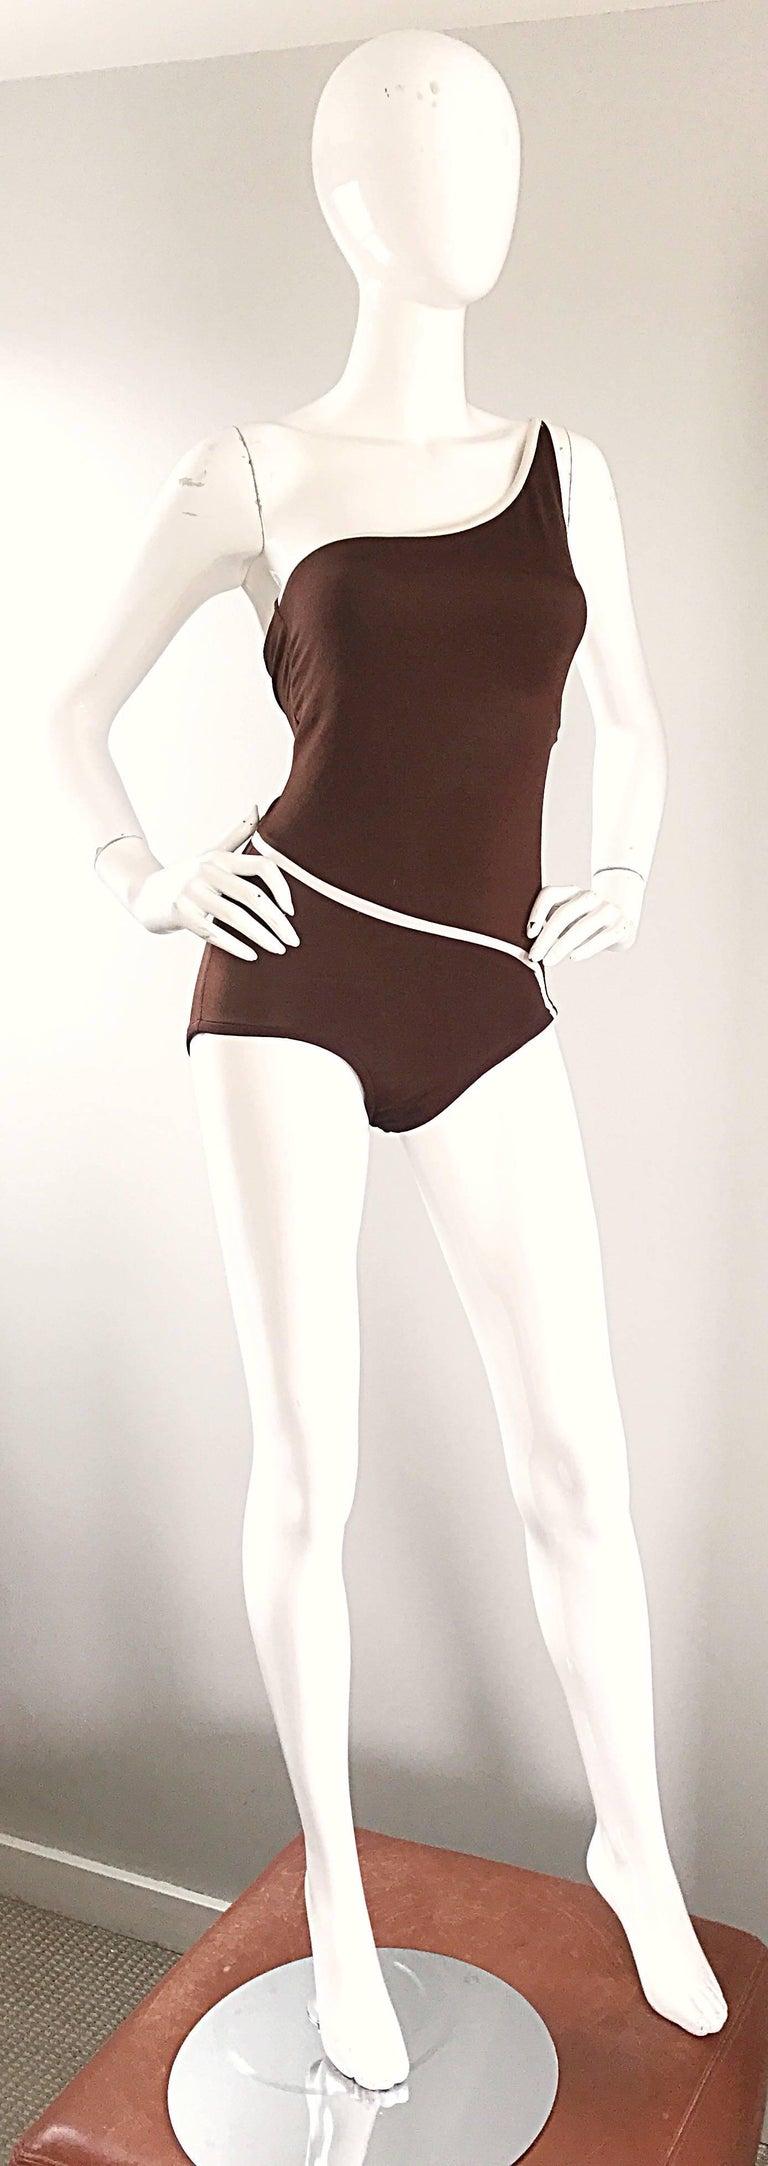 Women's 1970s Bill Blass Brown White One Shoulder Vintage One Piece Swimsuit Bodysuit For Sale